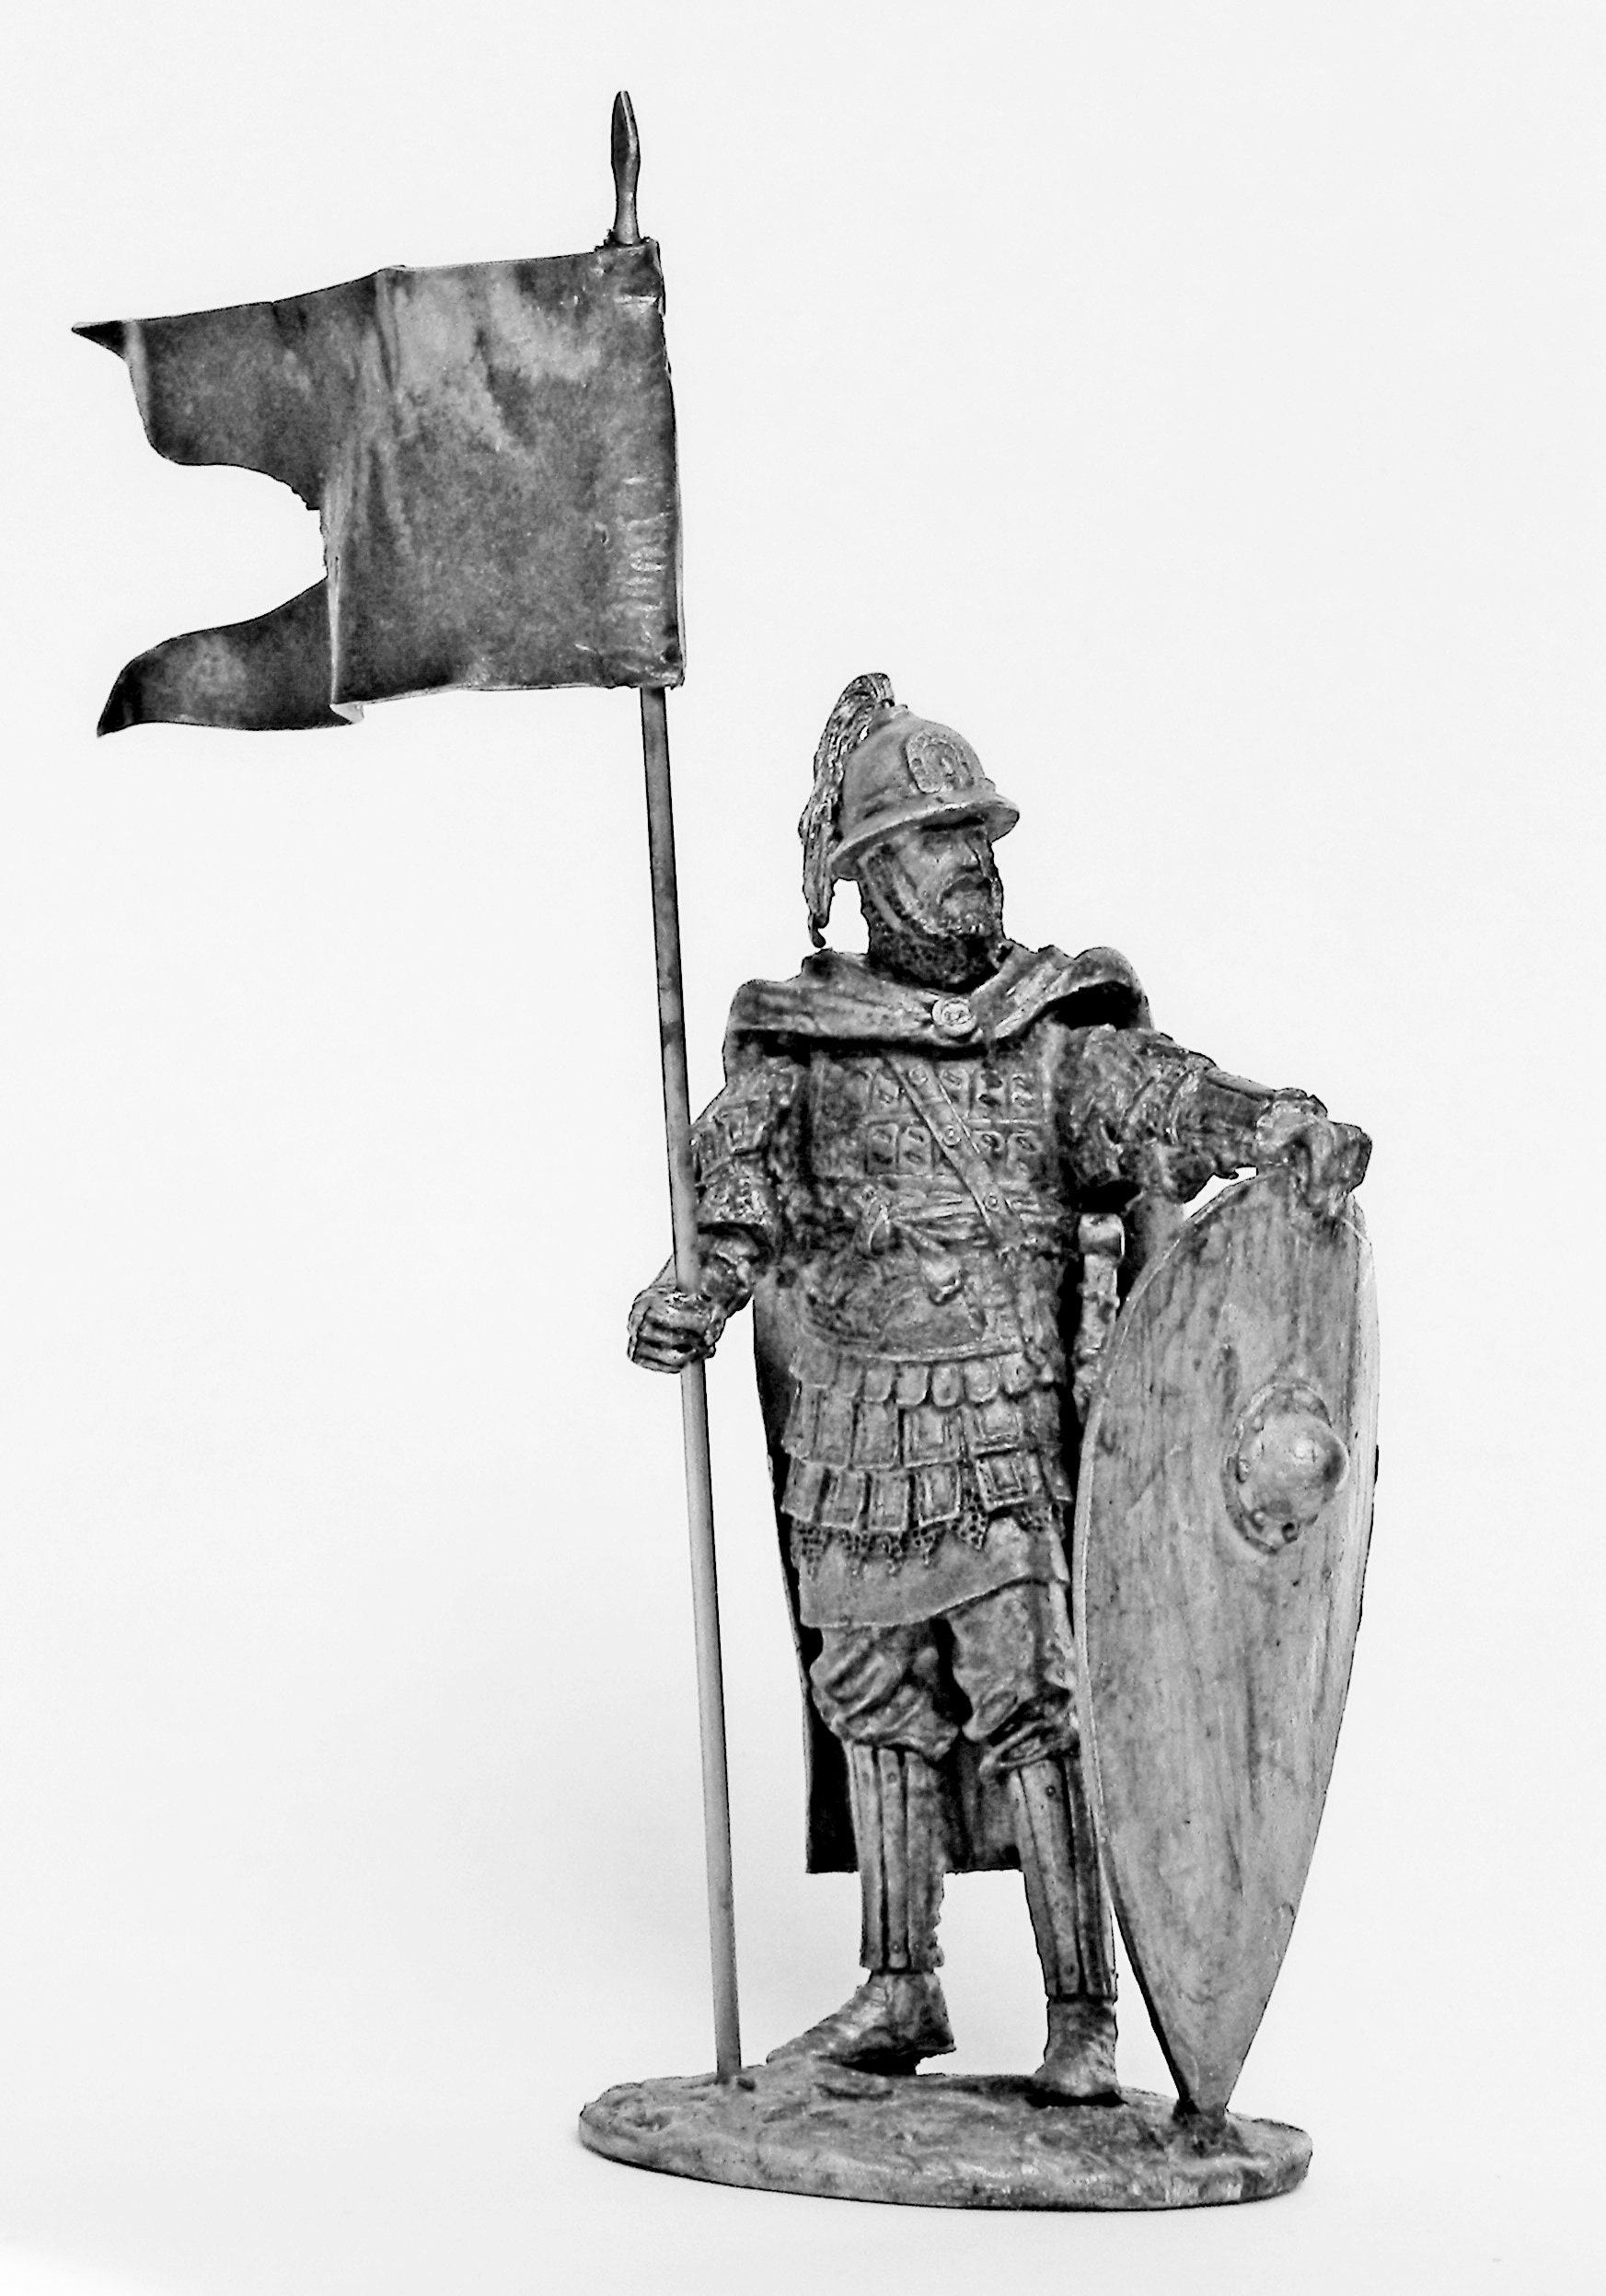 Tin soldier. Tin miniature. Pewter sculpture. Byzantine